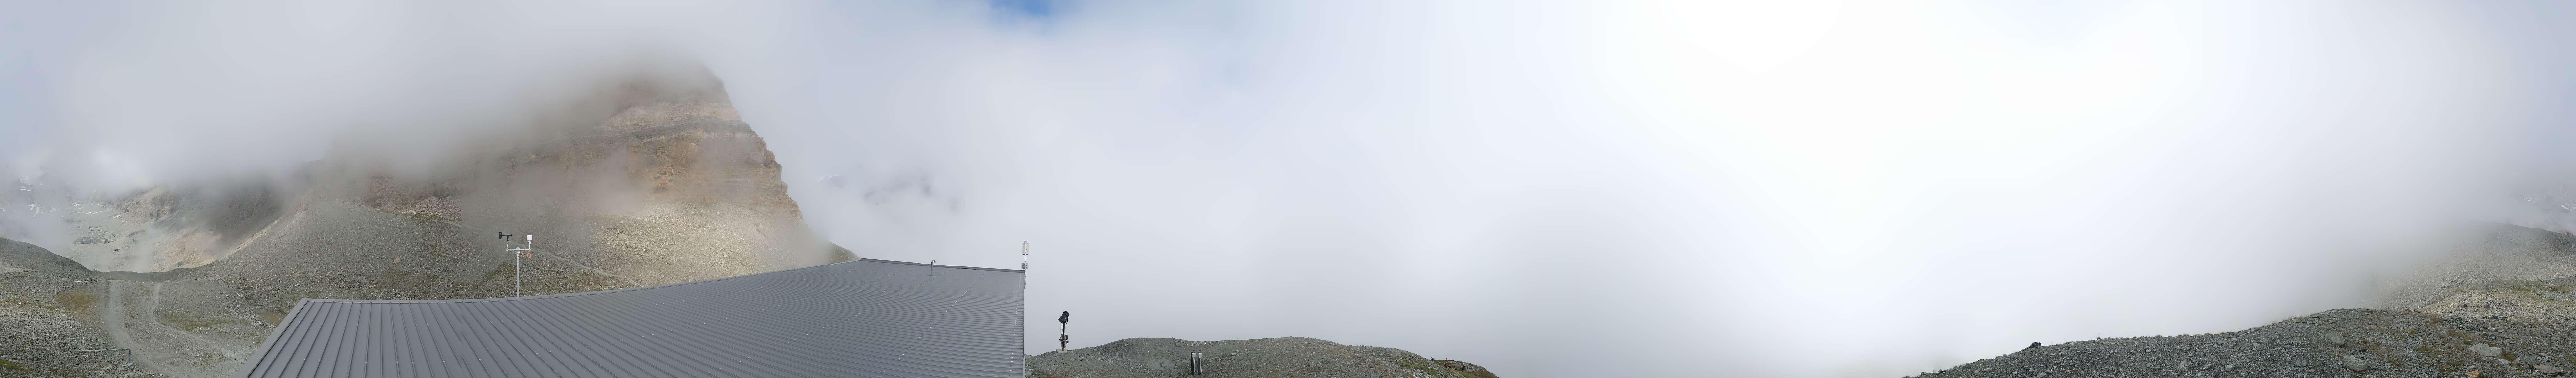 Livecam Zermatt Hirli